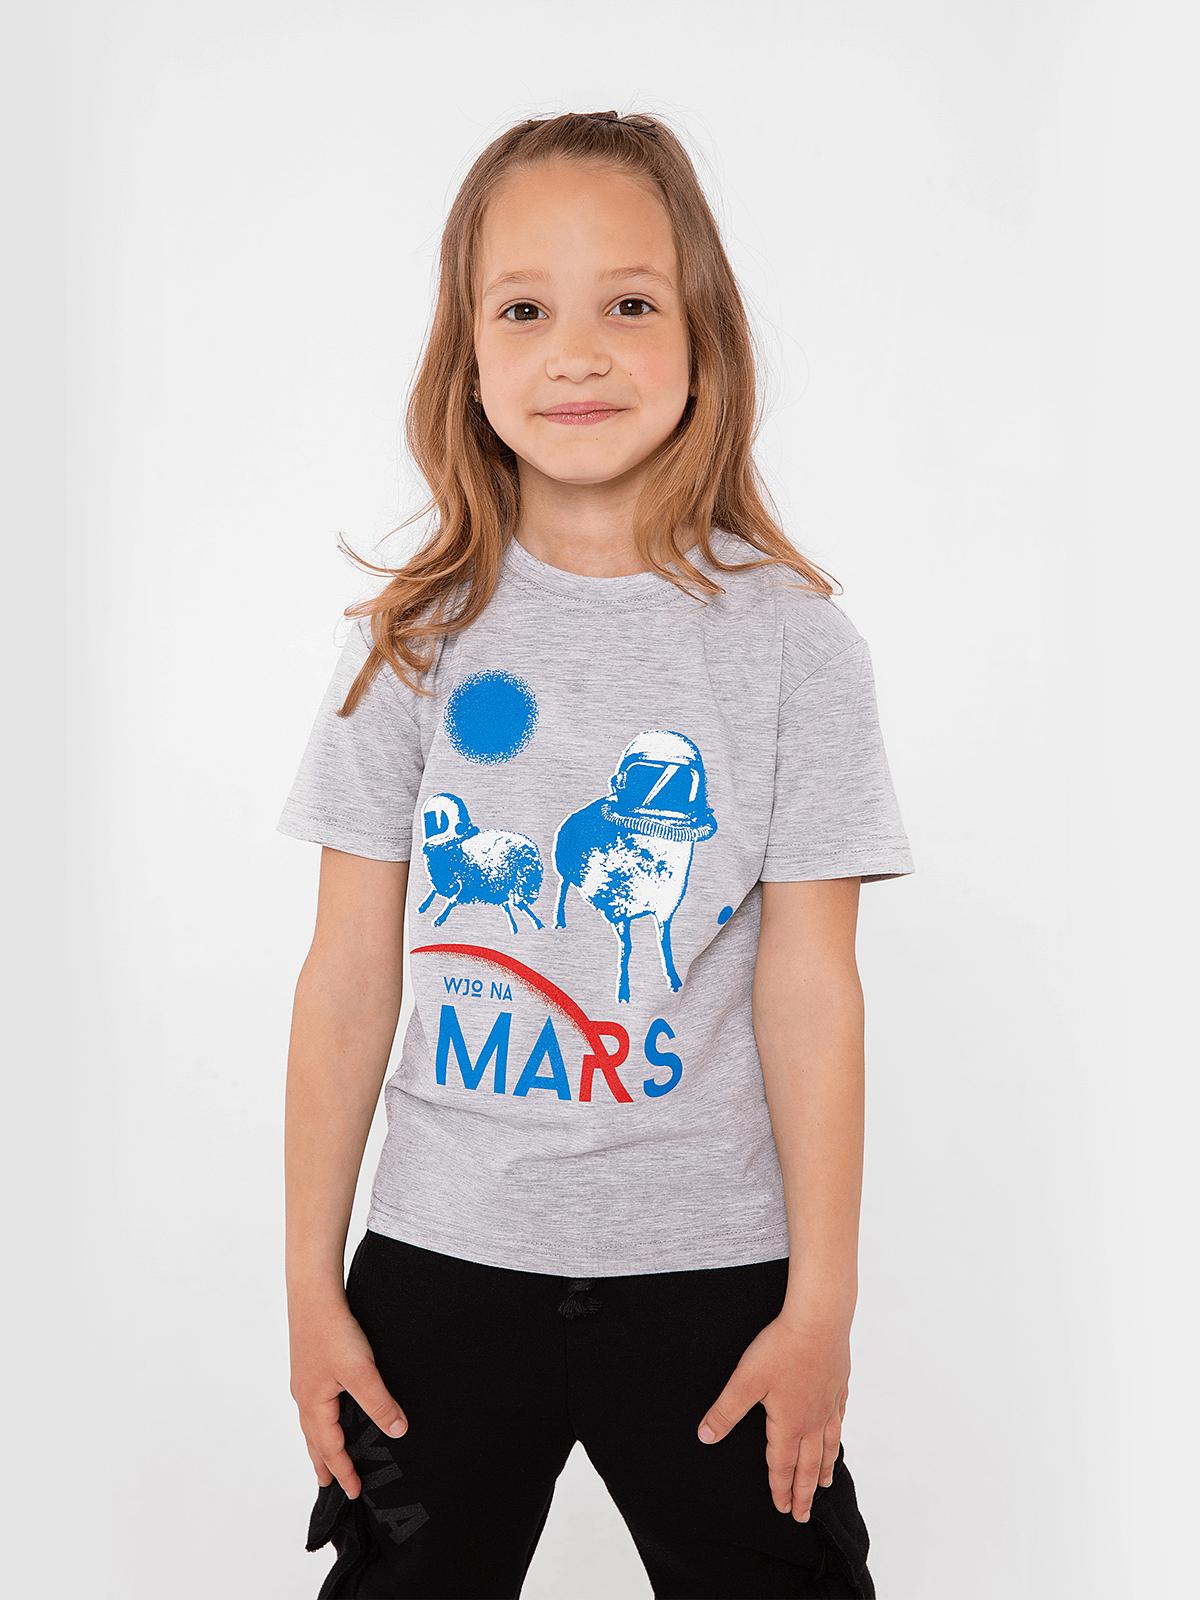 Kids T-Shirt Wjo Na Mars. Color gray. .